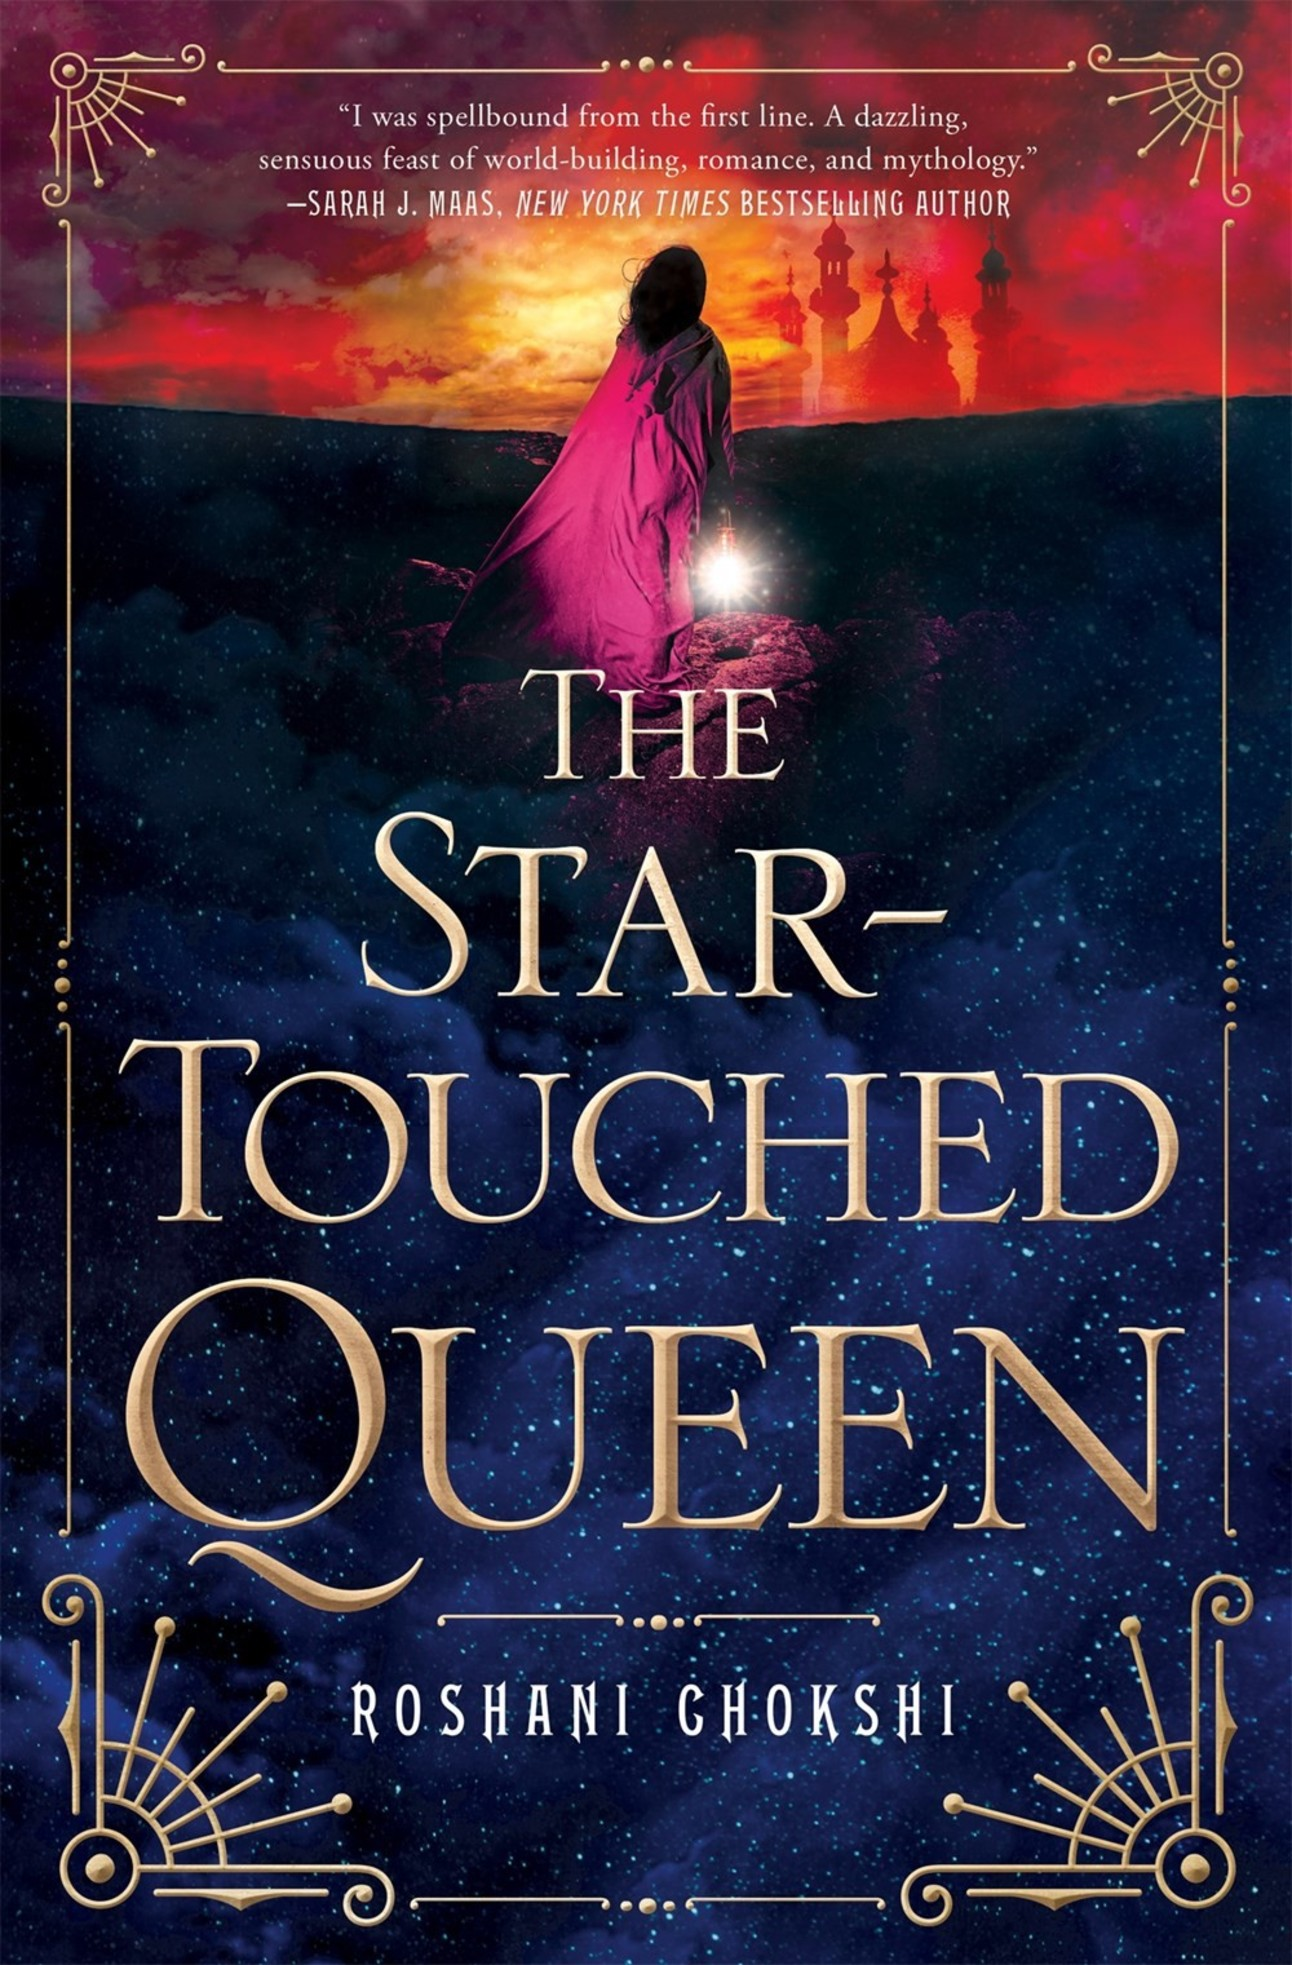 star-touched queen roshani chokshi